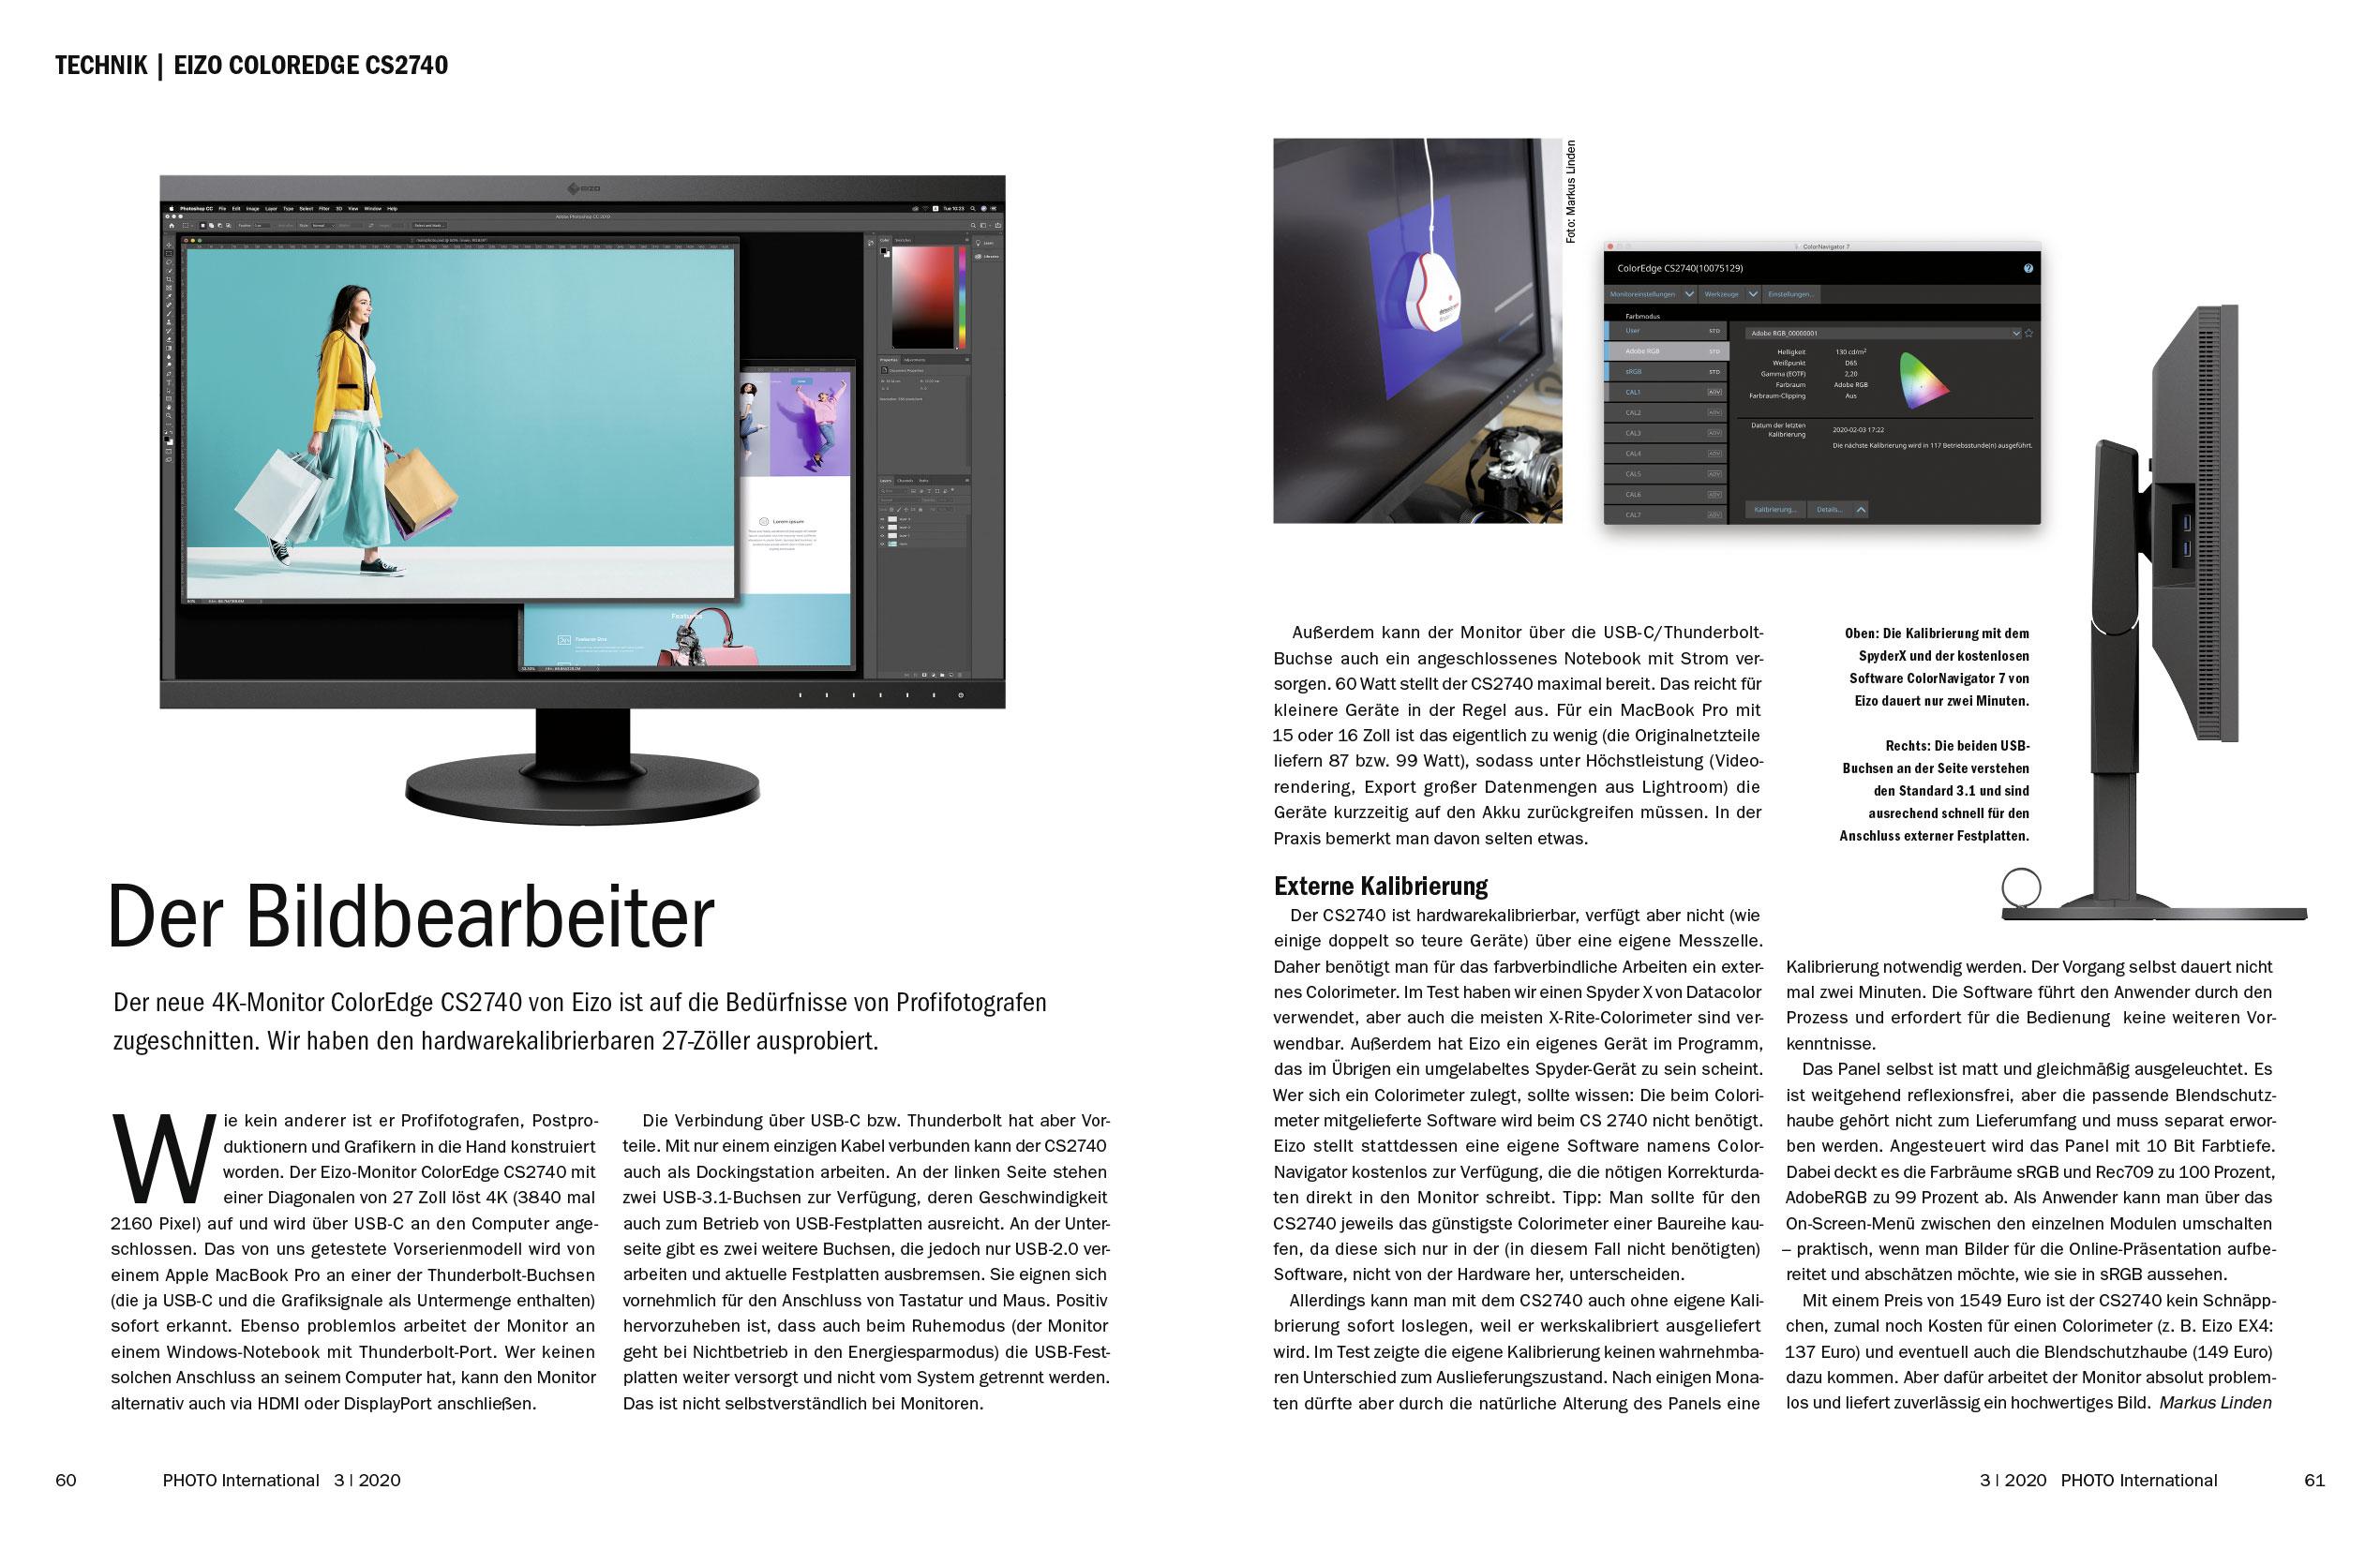 Technik_EIZO-Coloredge-CS2740-Monitor-Photo-International-03-2020